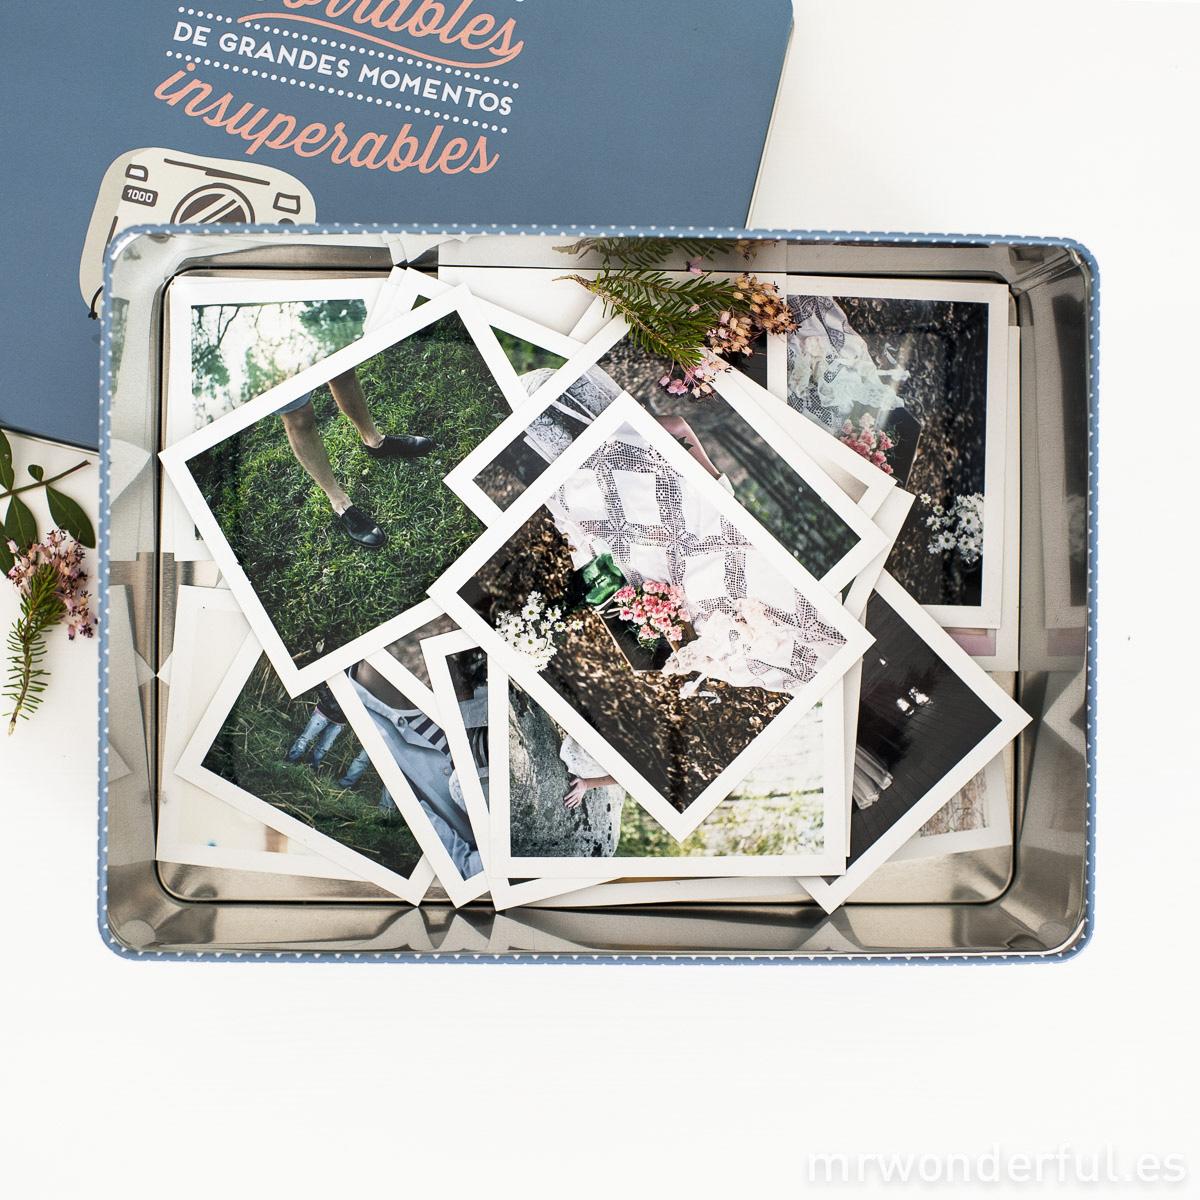 Caja metálica Mr.Wonderful- Pequeños recuerdos imborrables